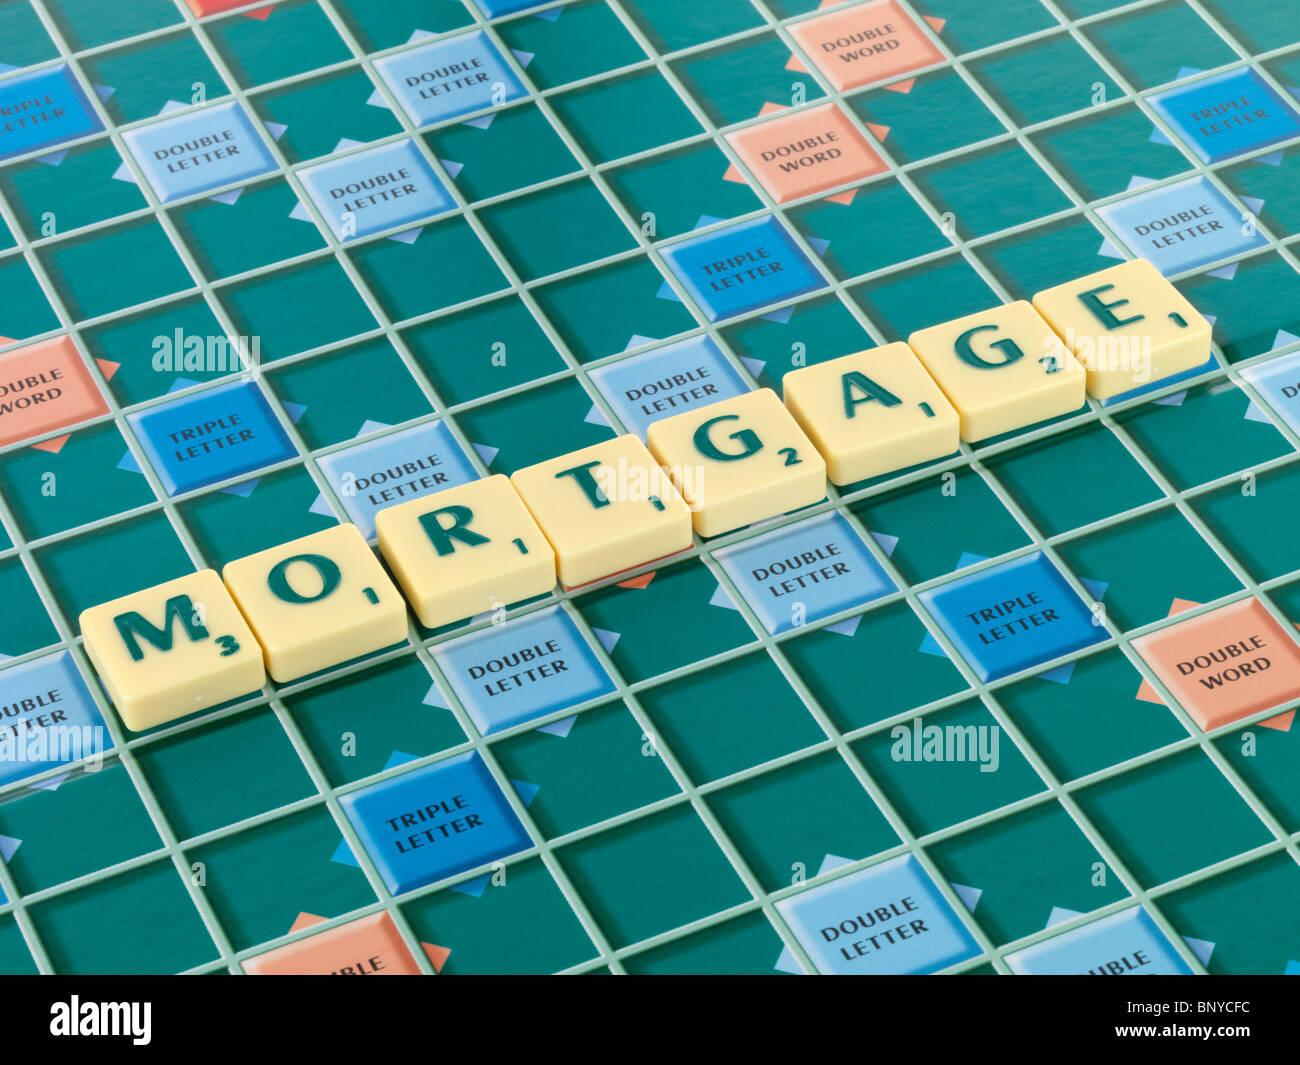 Mortgage - Stock Image